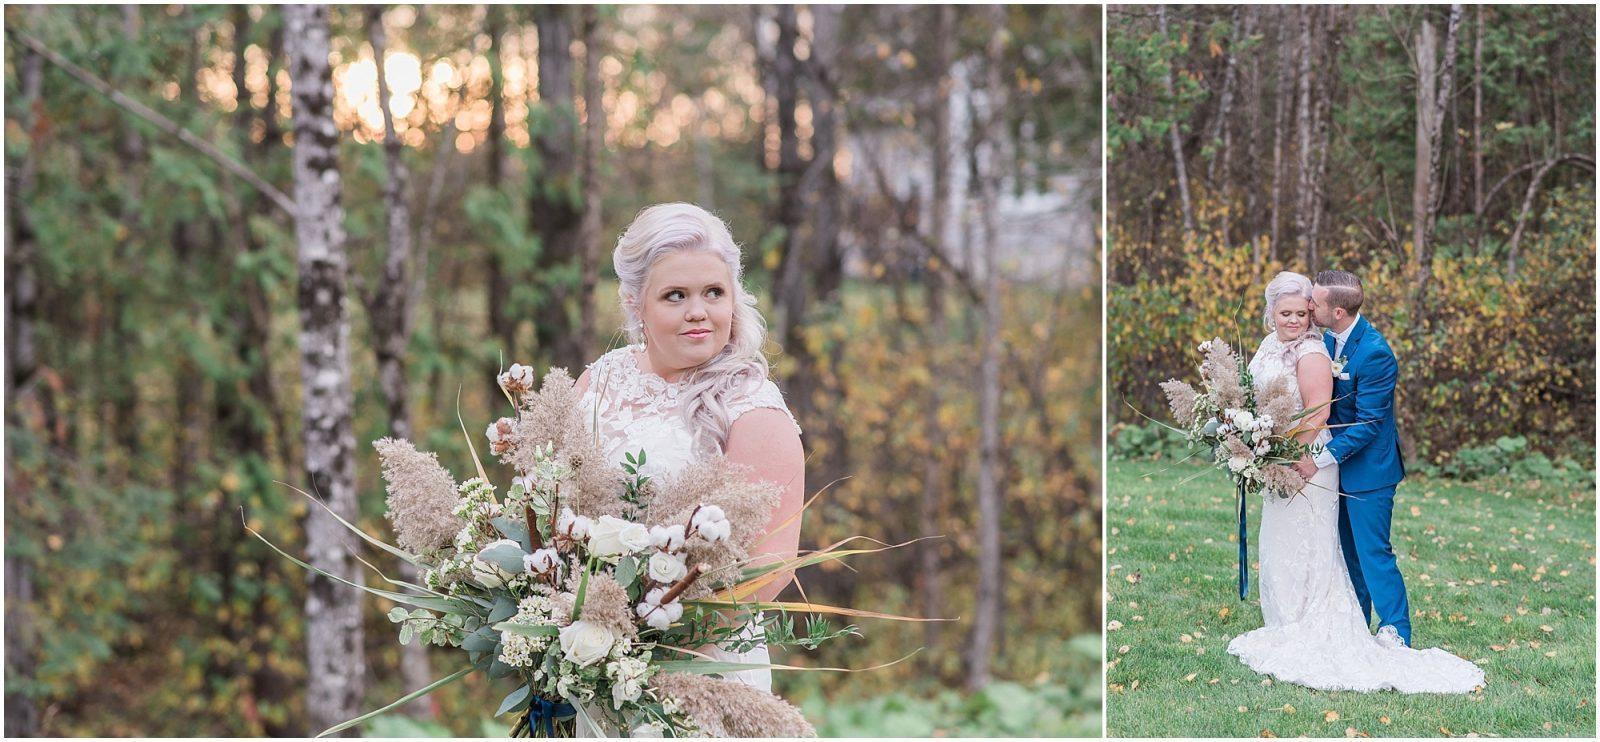 0048 Bethany and Luc - Fall Backyard Ottawa Wedding - Copper and Navy - PhotosbyEmmaH.jpg